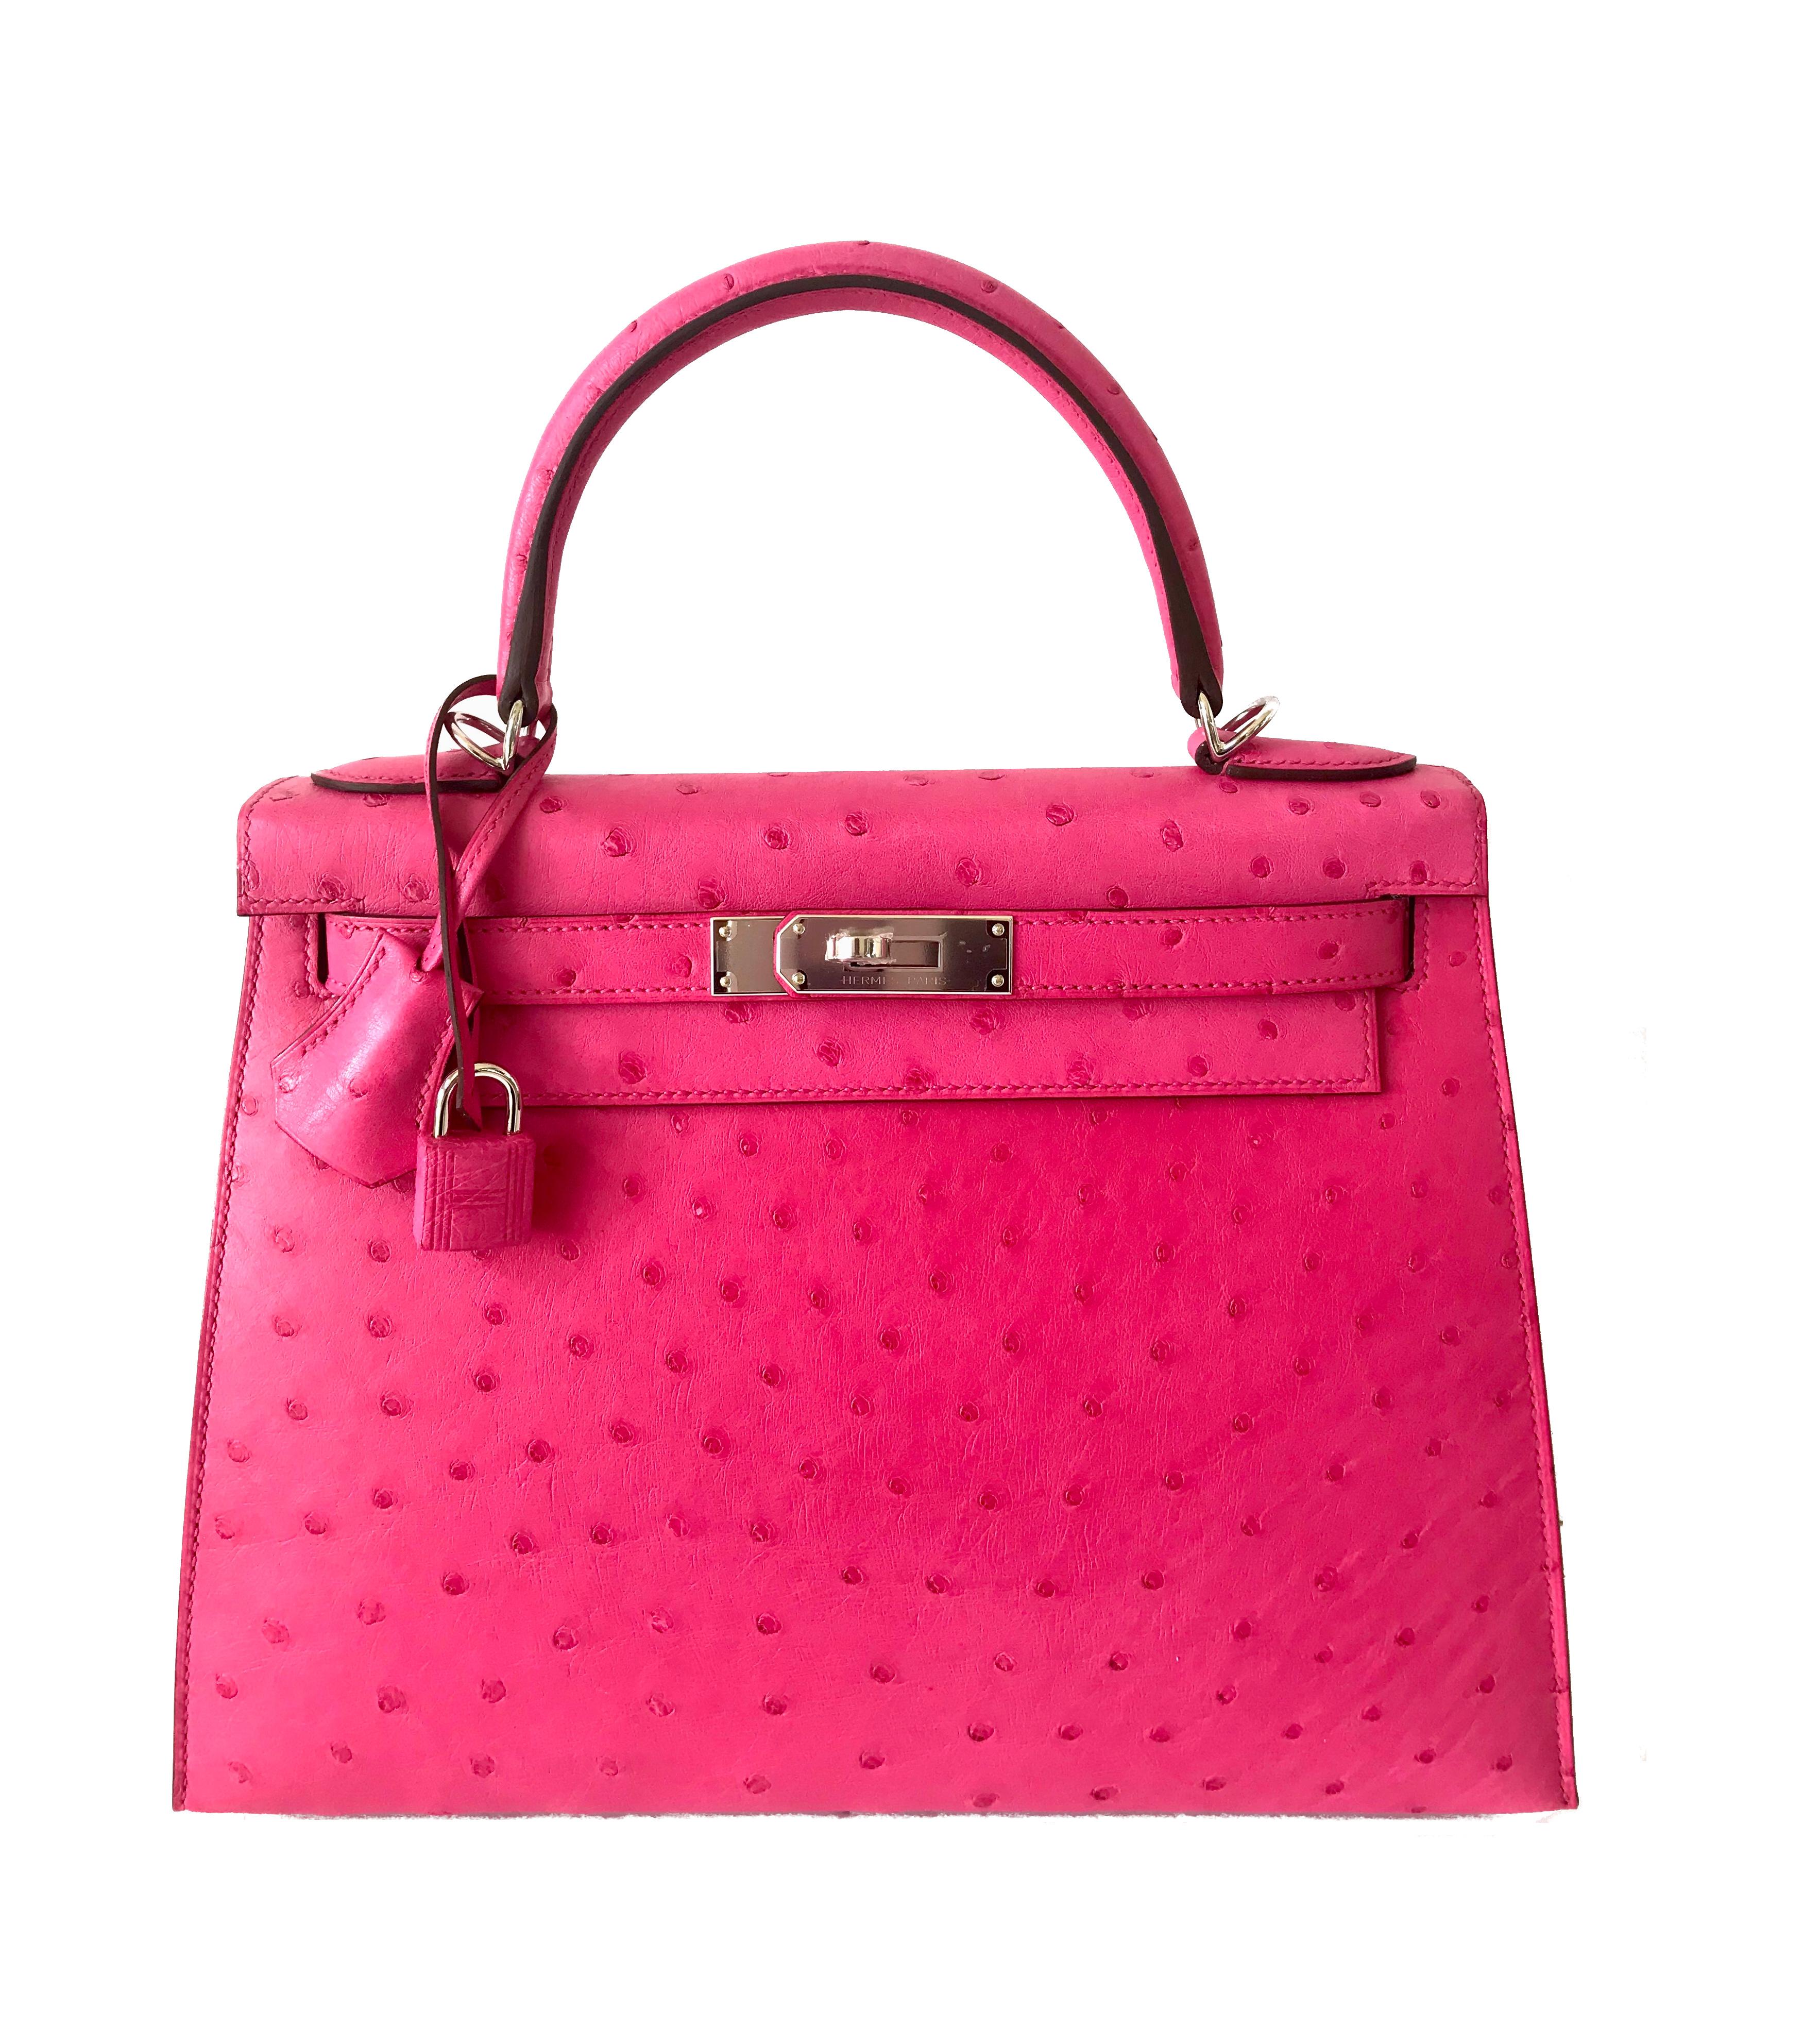 Palladium Saint Louis: AAA Replica Kelly Bag 28cm Rose Tyrien Pink Ostrich